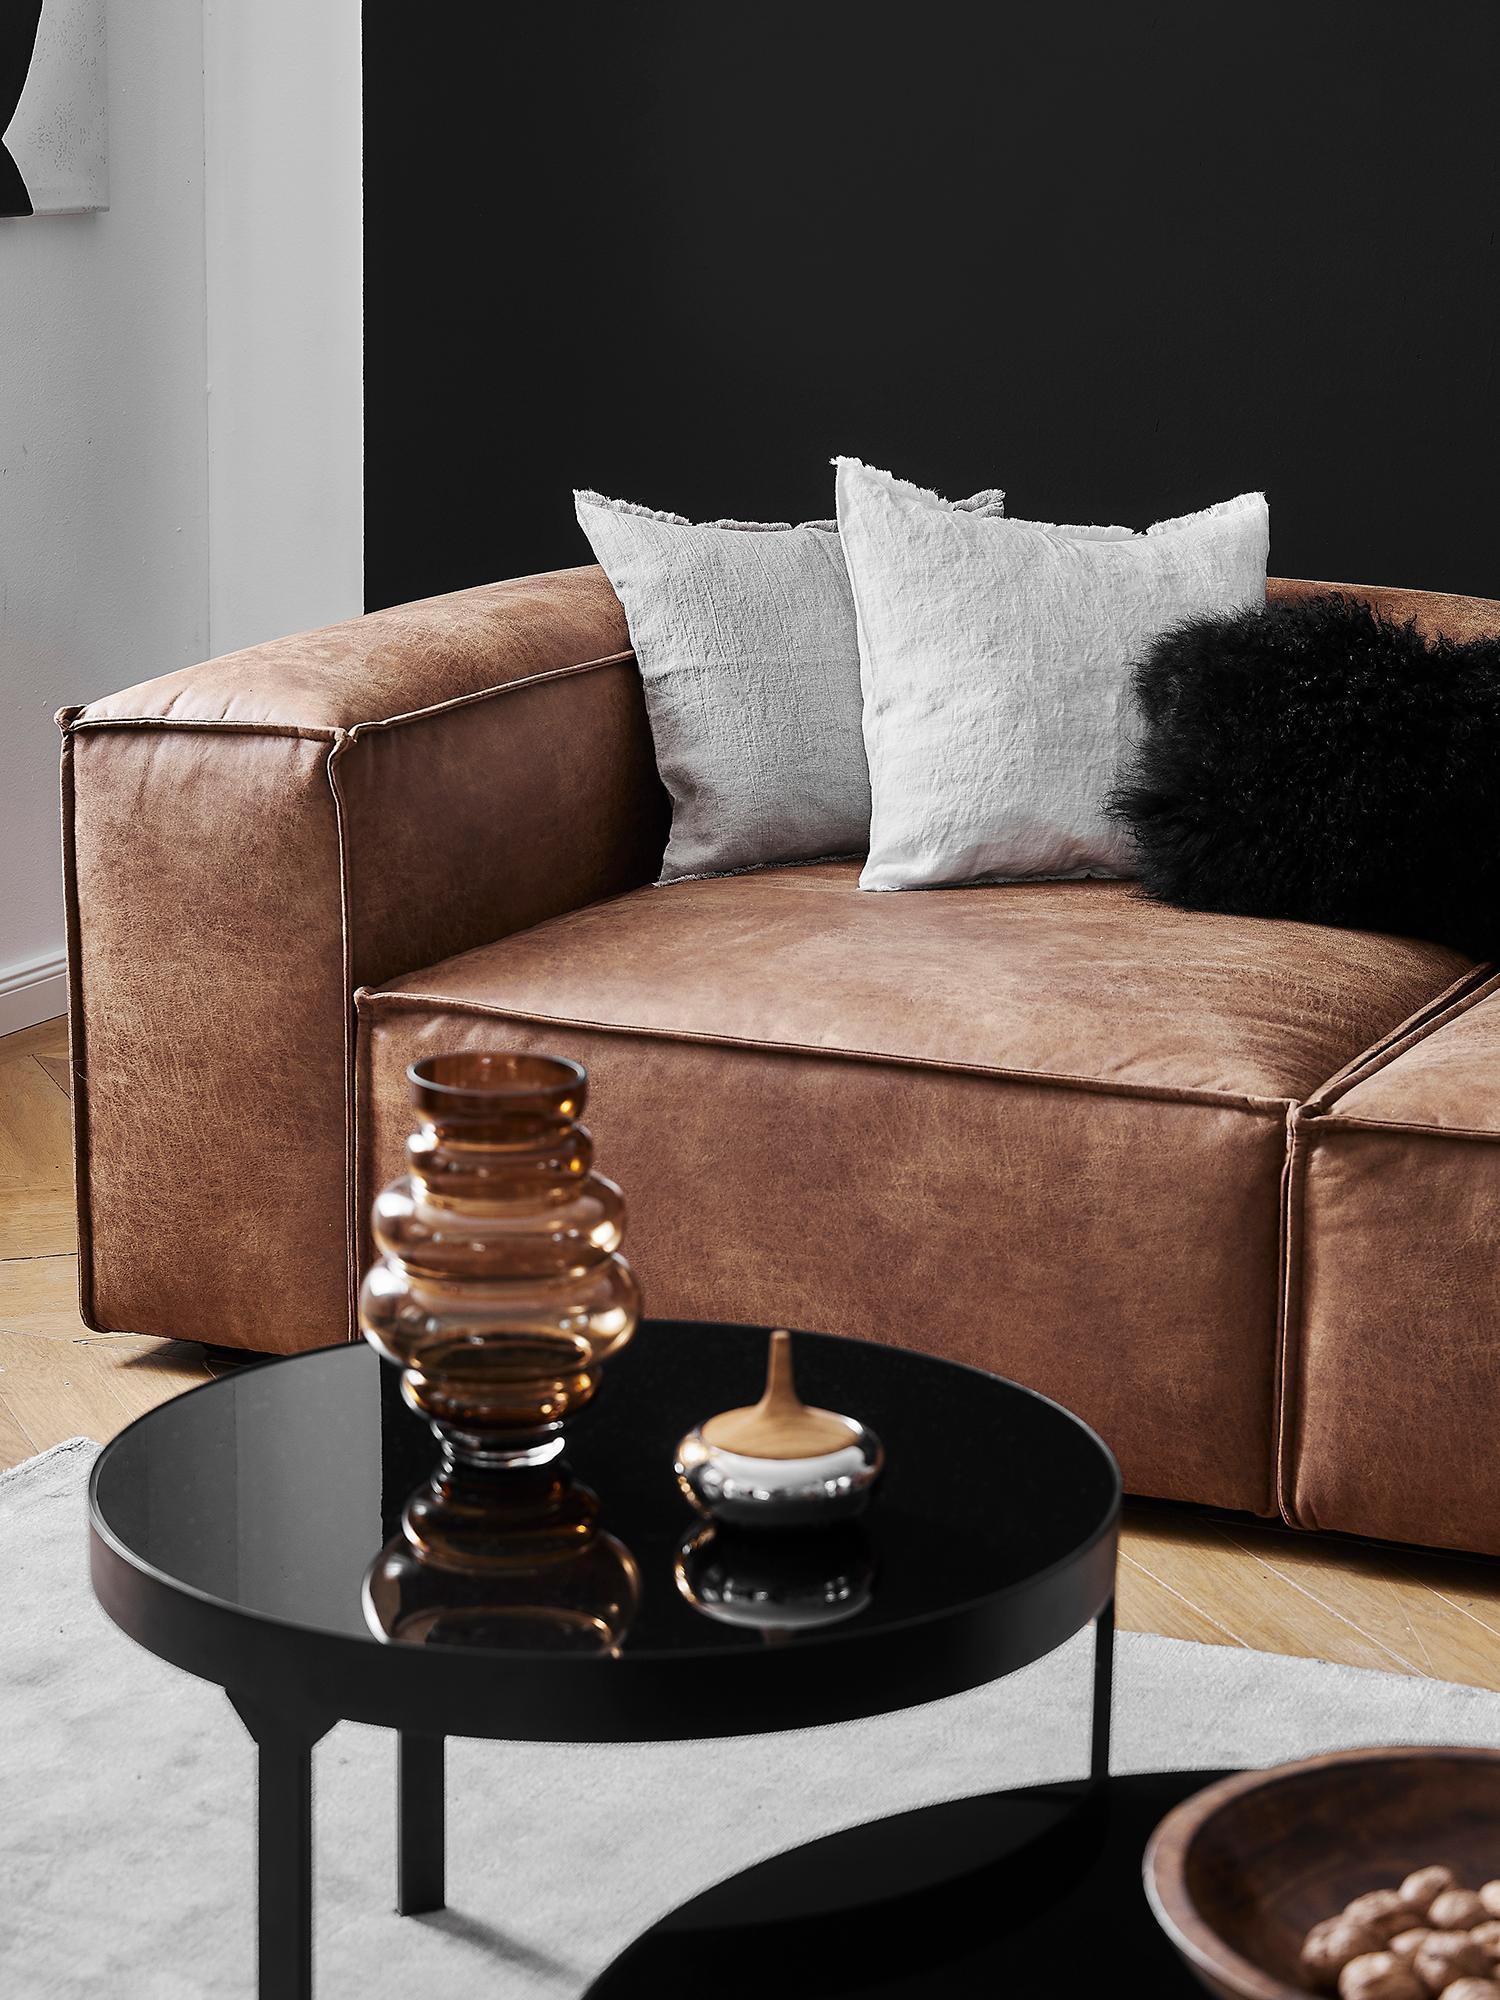 Sofá rinconera modular de cuero Lennon, Tapizado: 70%cuero, 30%poliéster , Estructura: madera de pino maciza, ma, Patas: plástico, Cuero marrón, An 326 x F 207 cm